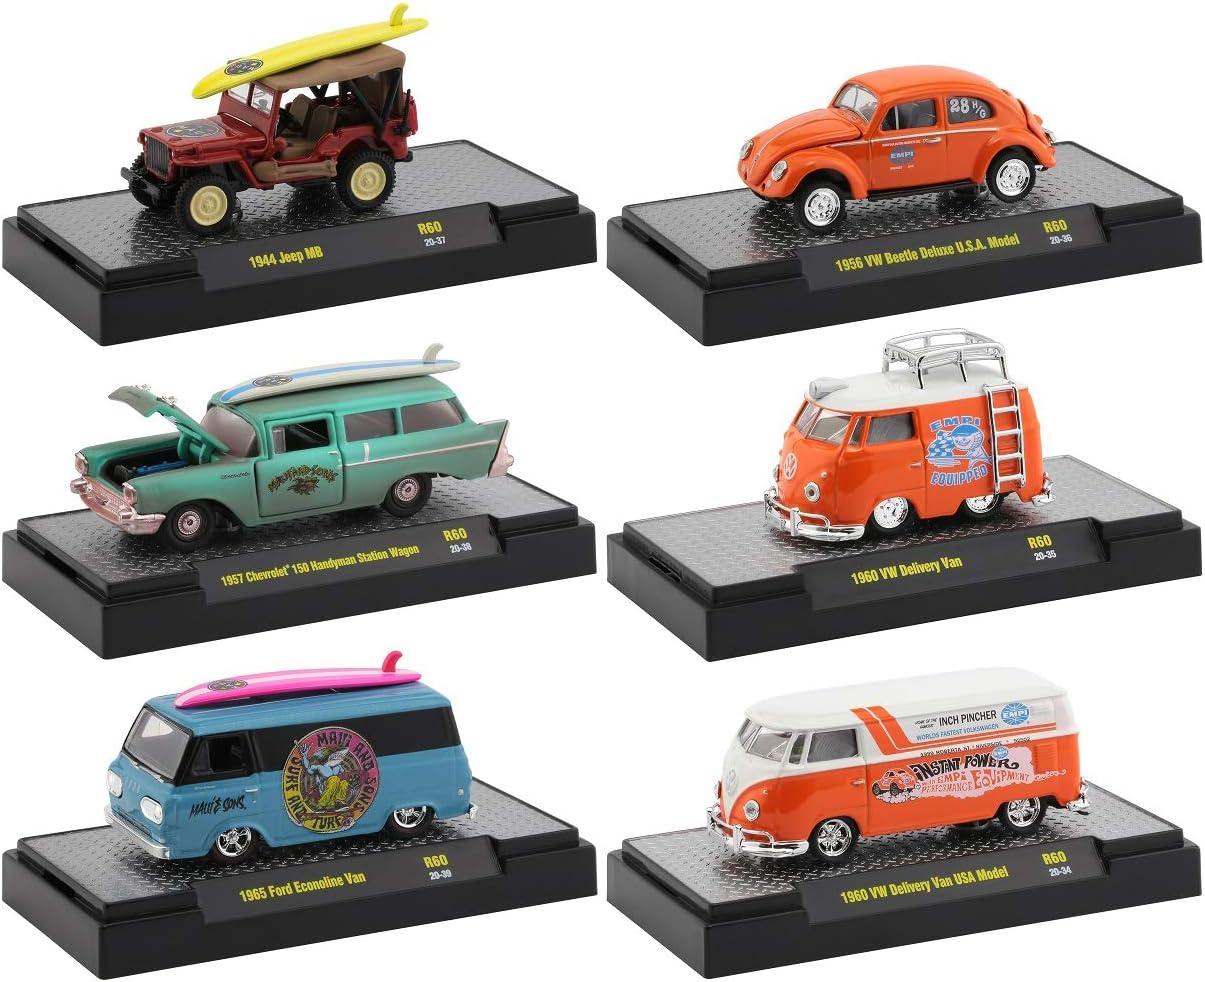 M2 Machines Auto Shows 6 Piece 贈物 Set 60 Display Cases 1 初売り Release in